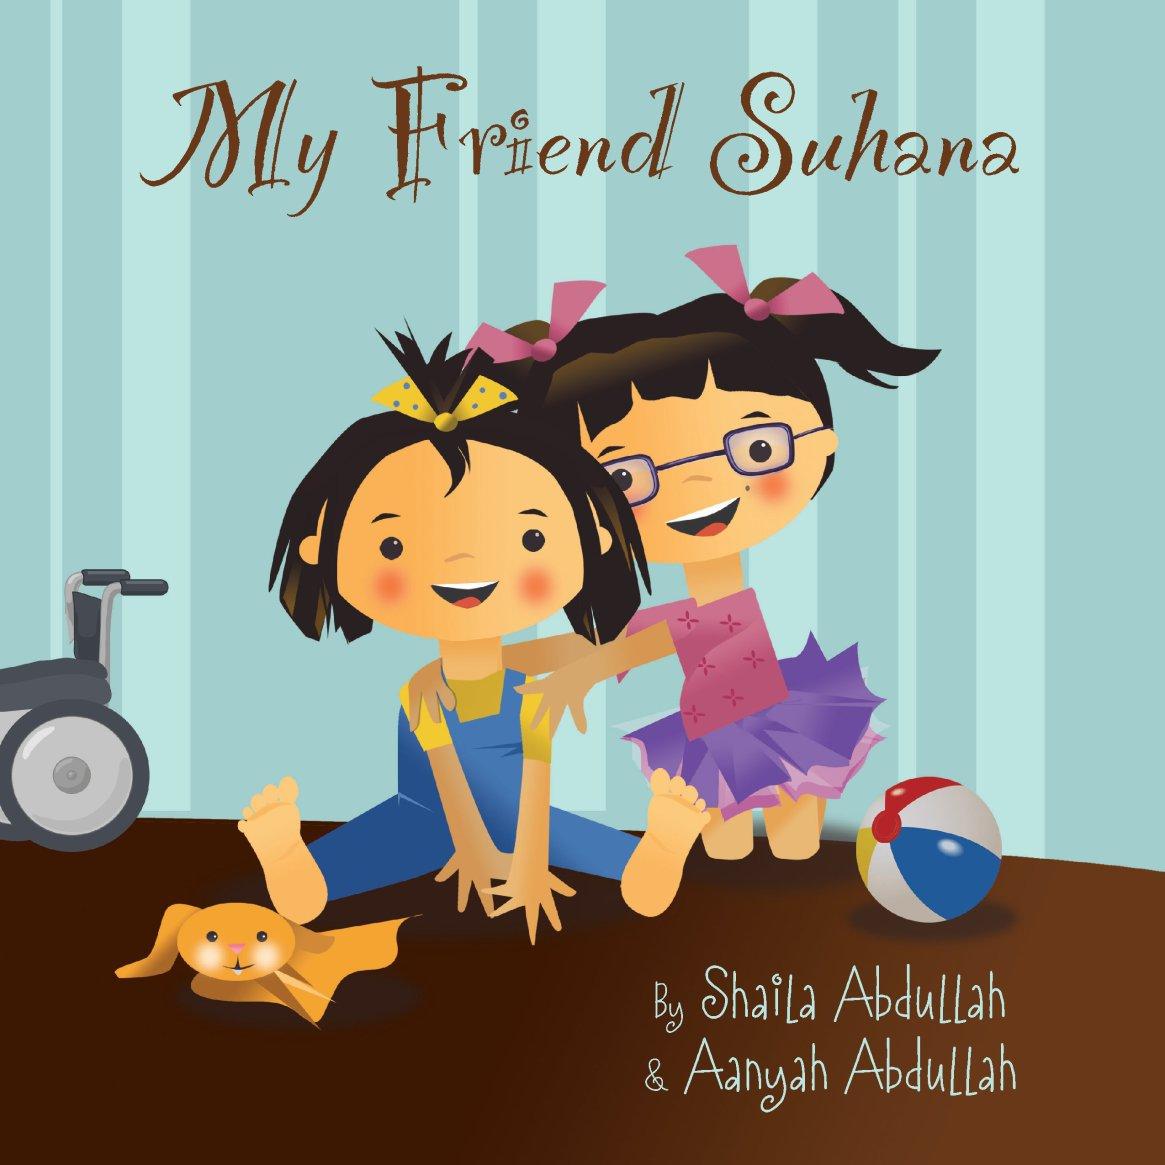 My Friend Suhana: A Story of Friendship and Cerebral Palsy 978-1-61599-211-9